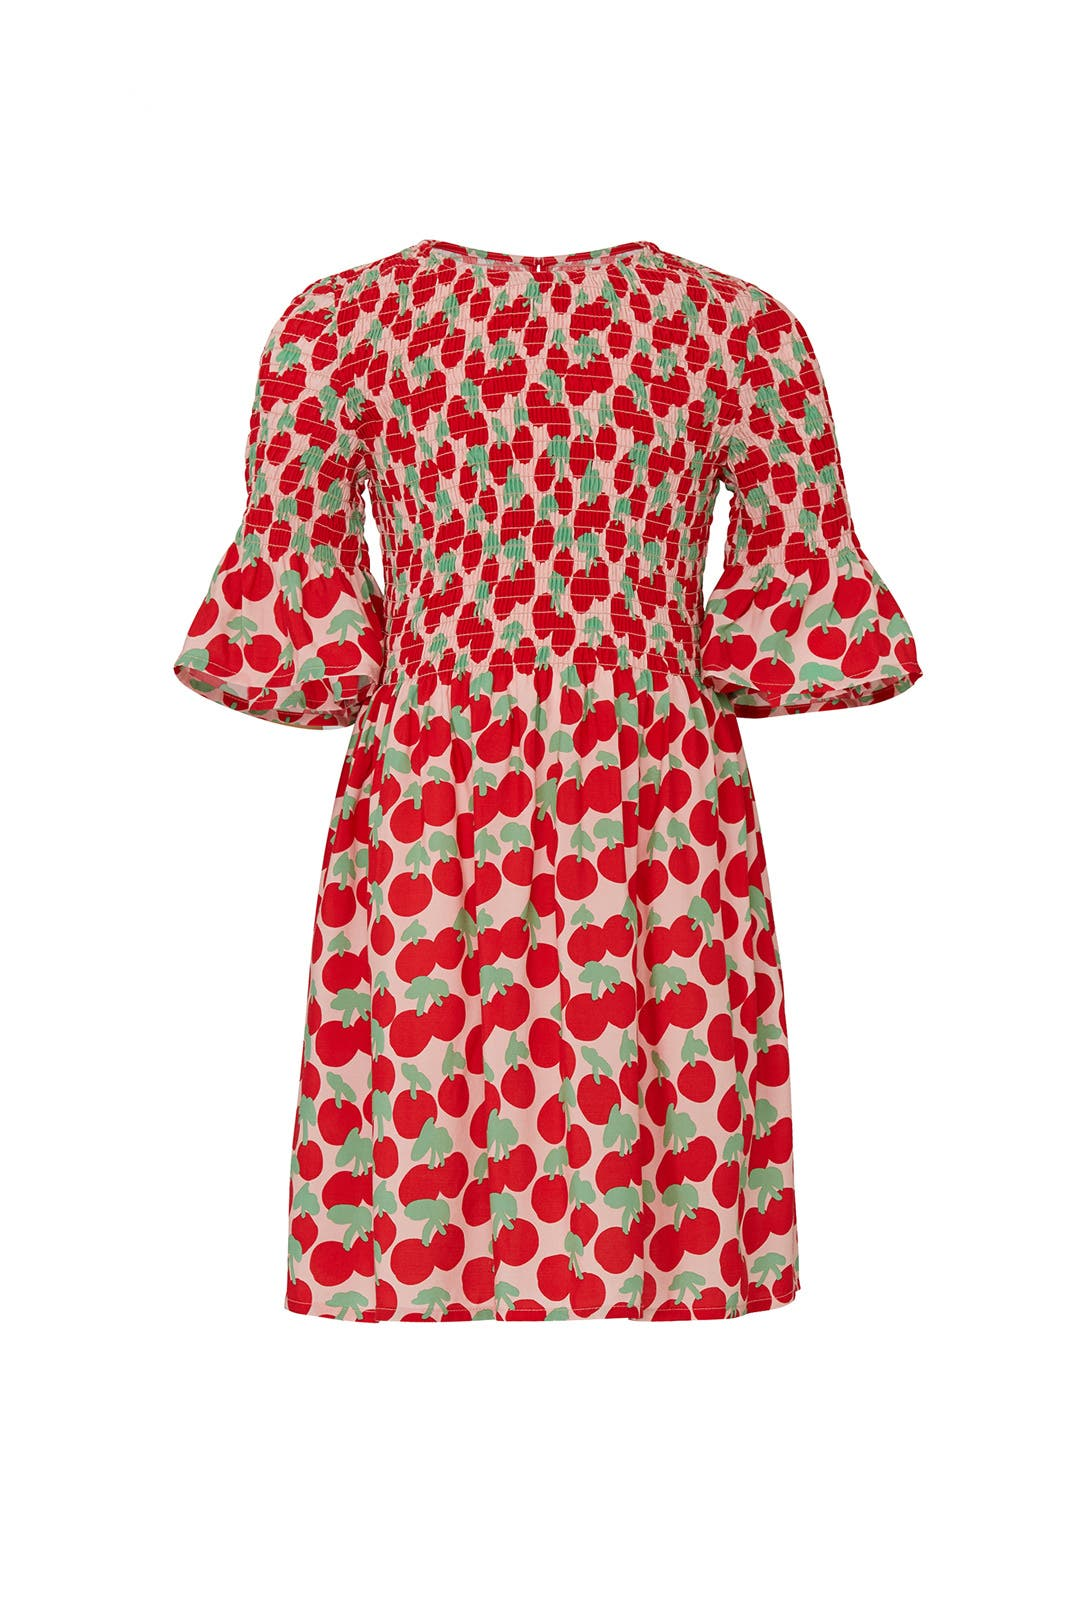 fdf6698ba92 Stella McCartney Kids. Read Reviews. Kids Cherry Smock Dress